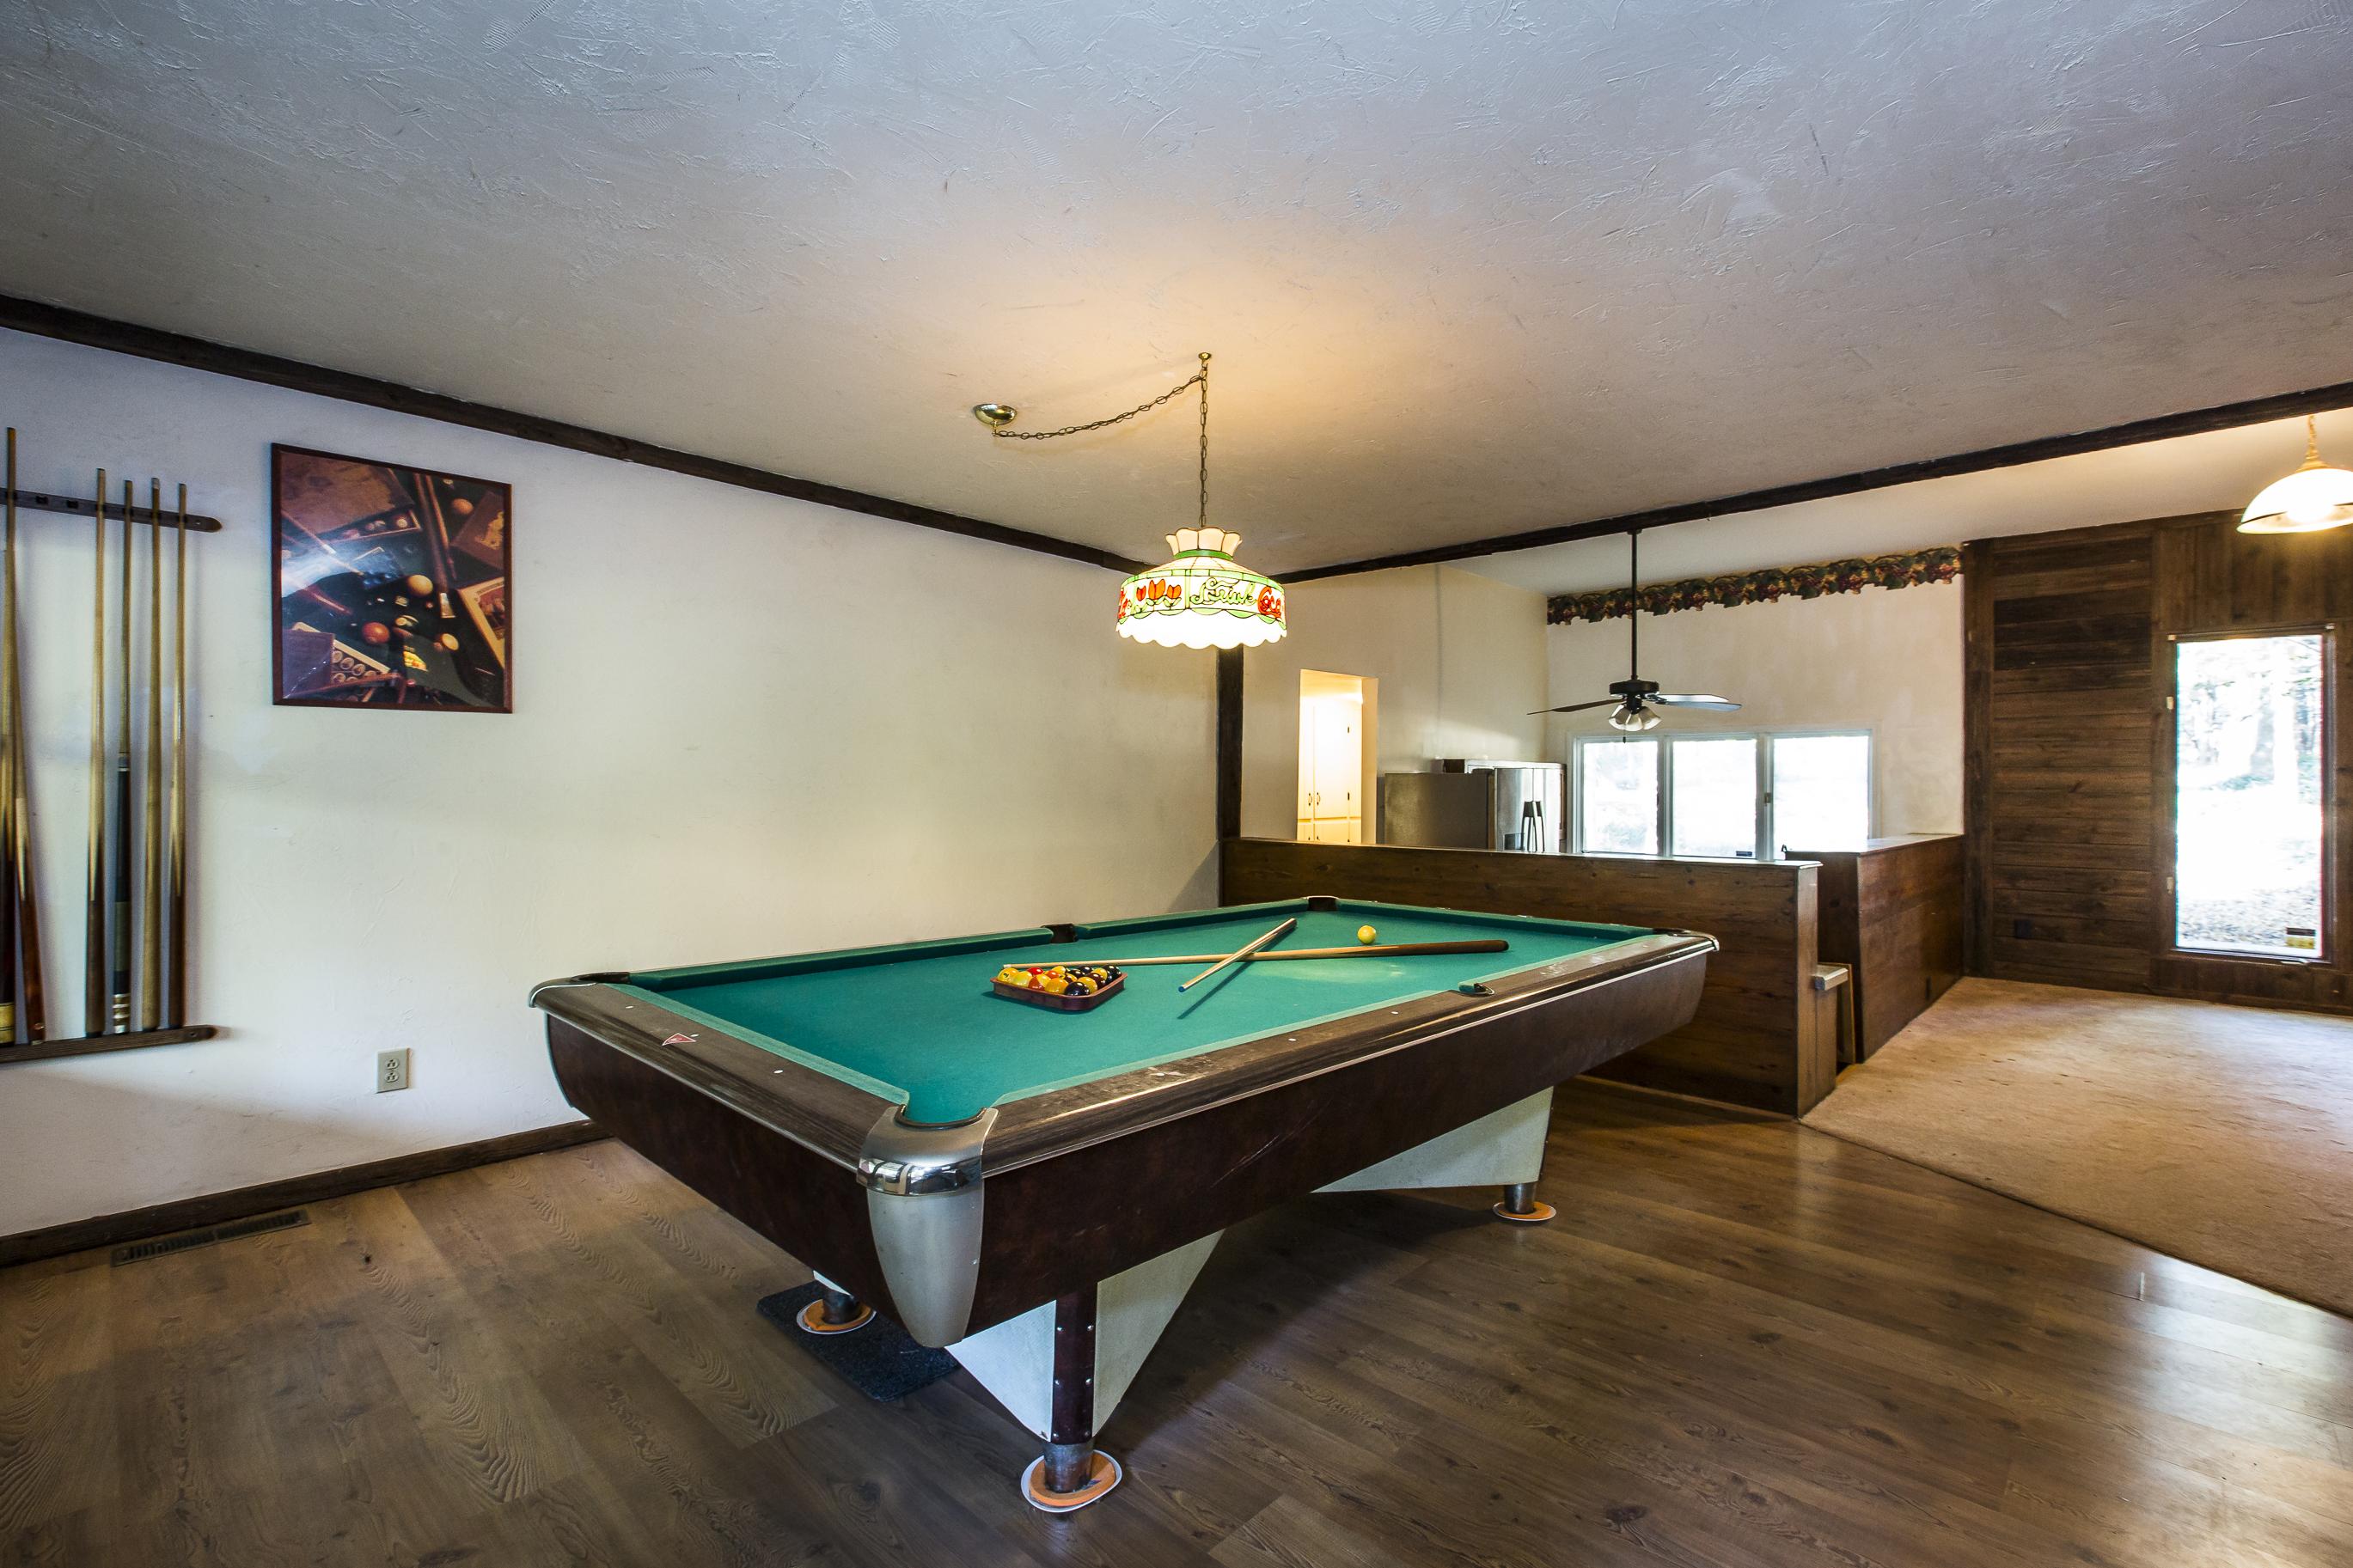 024_Billiards Room